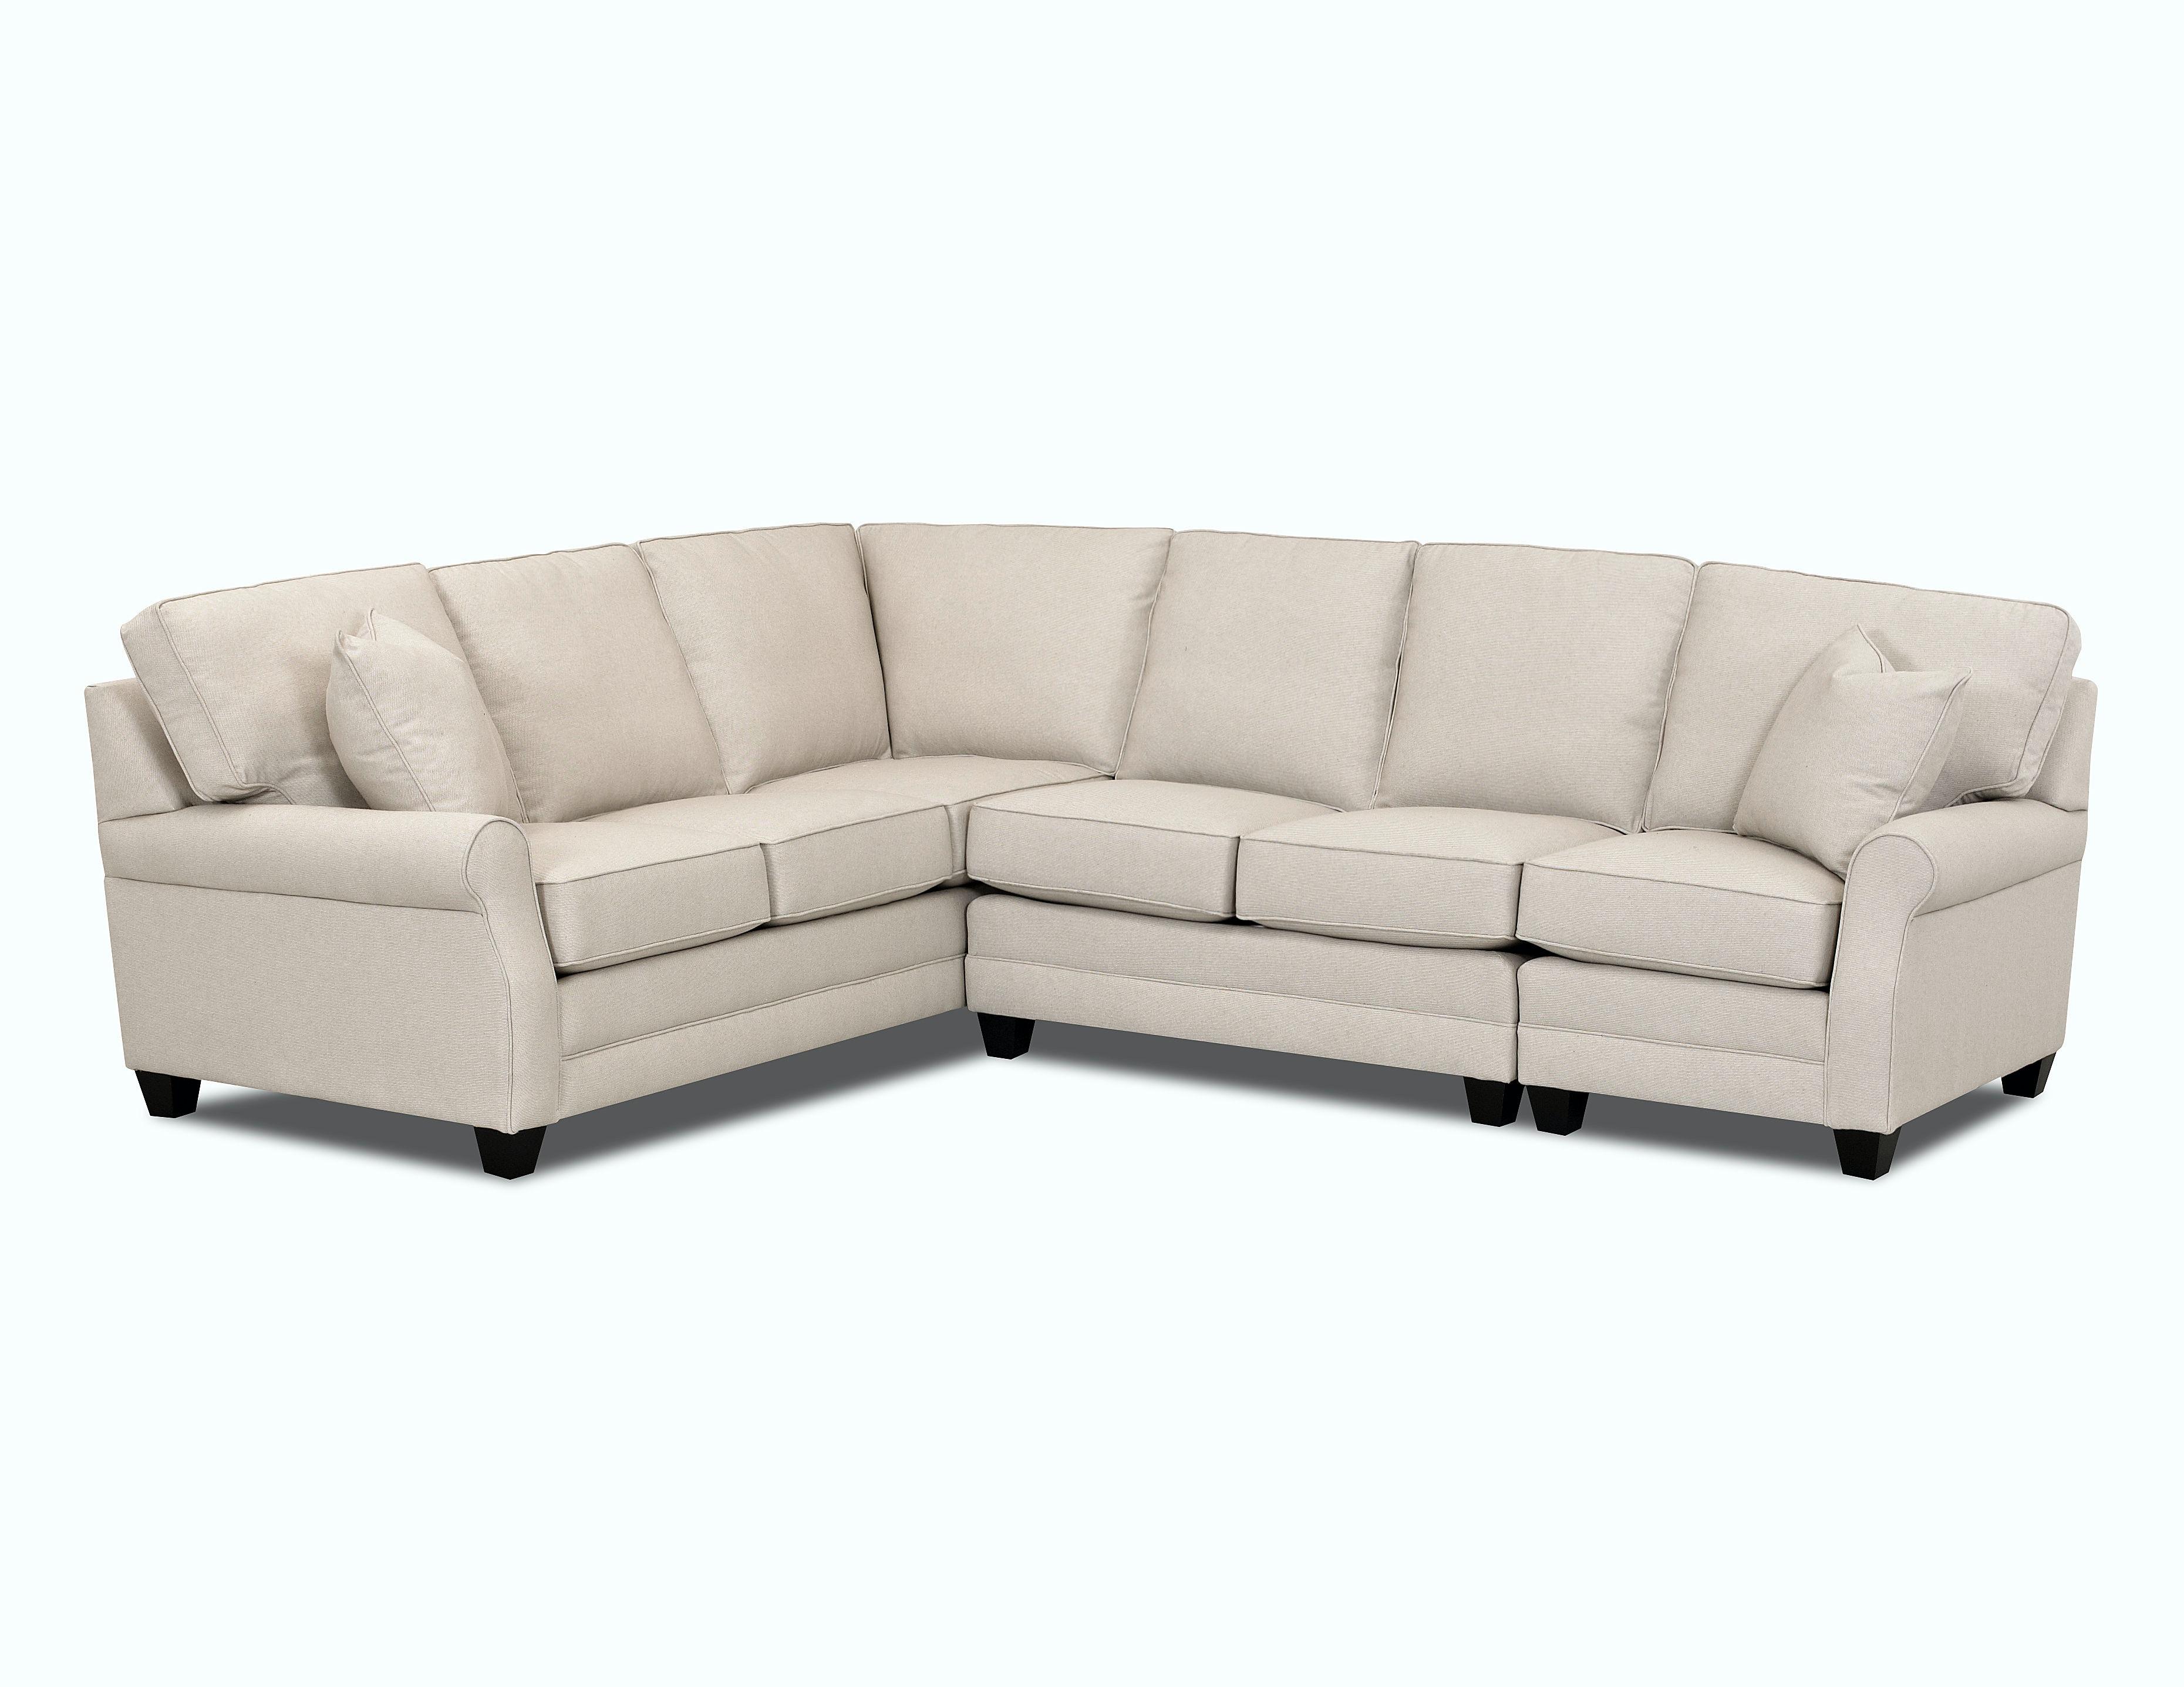 Comfort Design Loft Sectional C4032 SECT